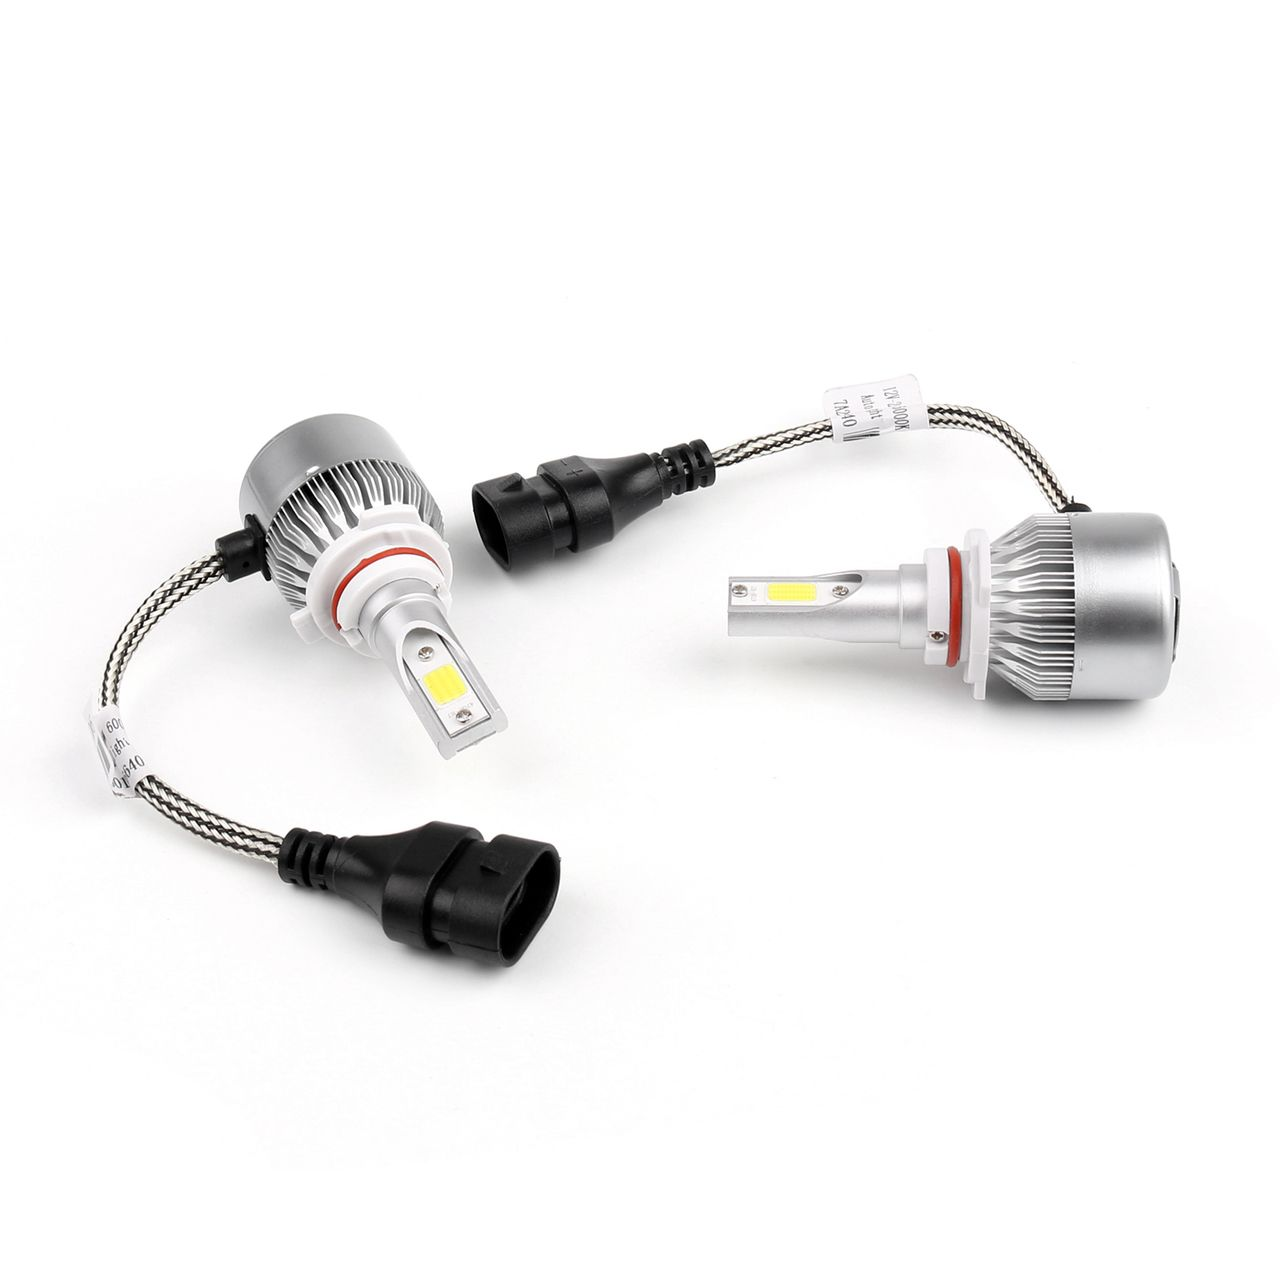 Car Auto Hb4 9006 Led Headlight Lamp Light 6000k 72w 7600lm White Plug Play C6 Lampen